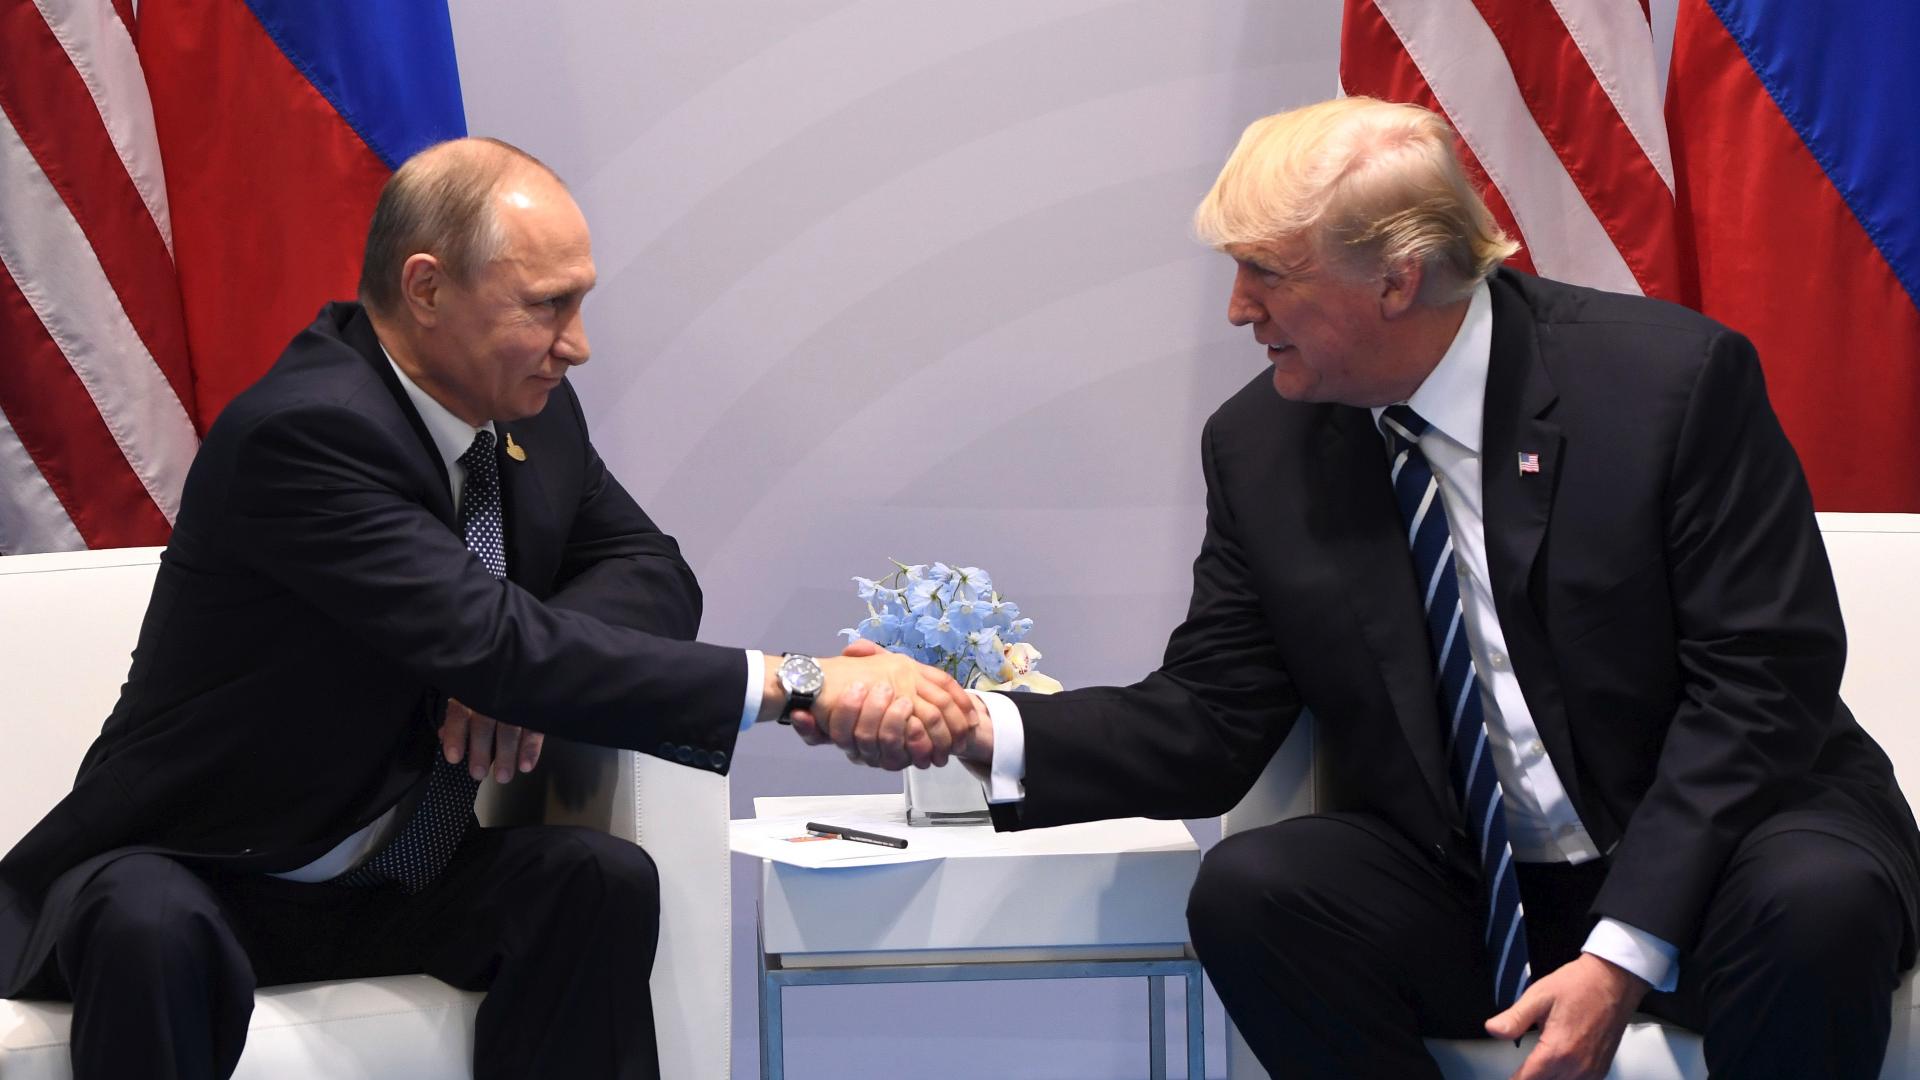 Trumps Many Handshakes From Awkward To Intense The Washington Post